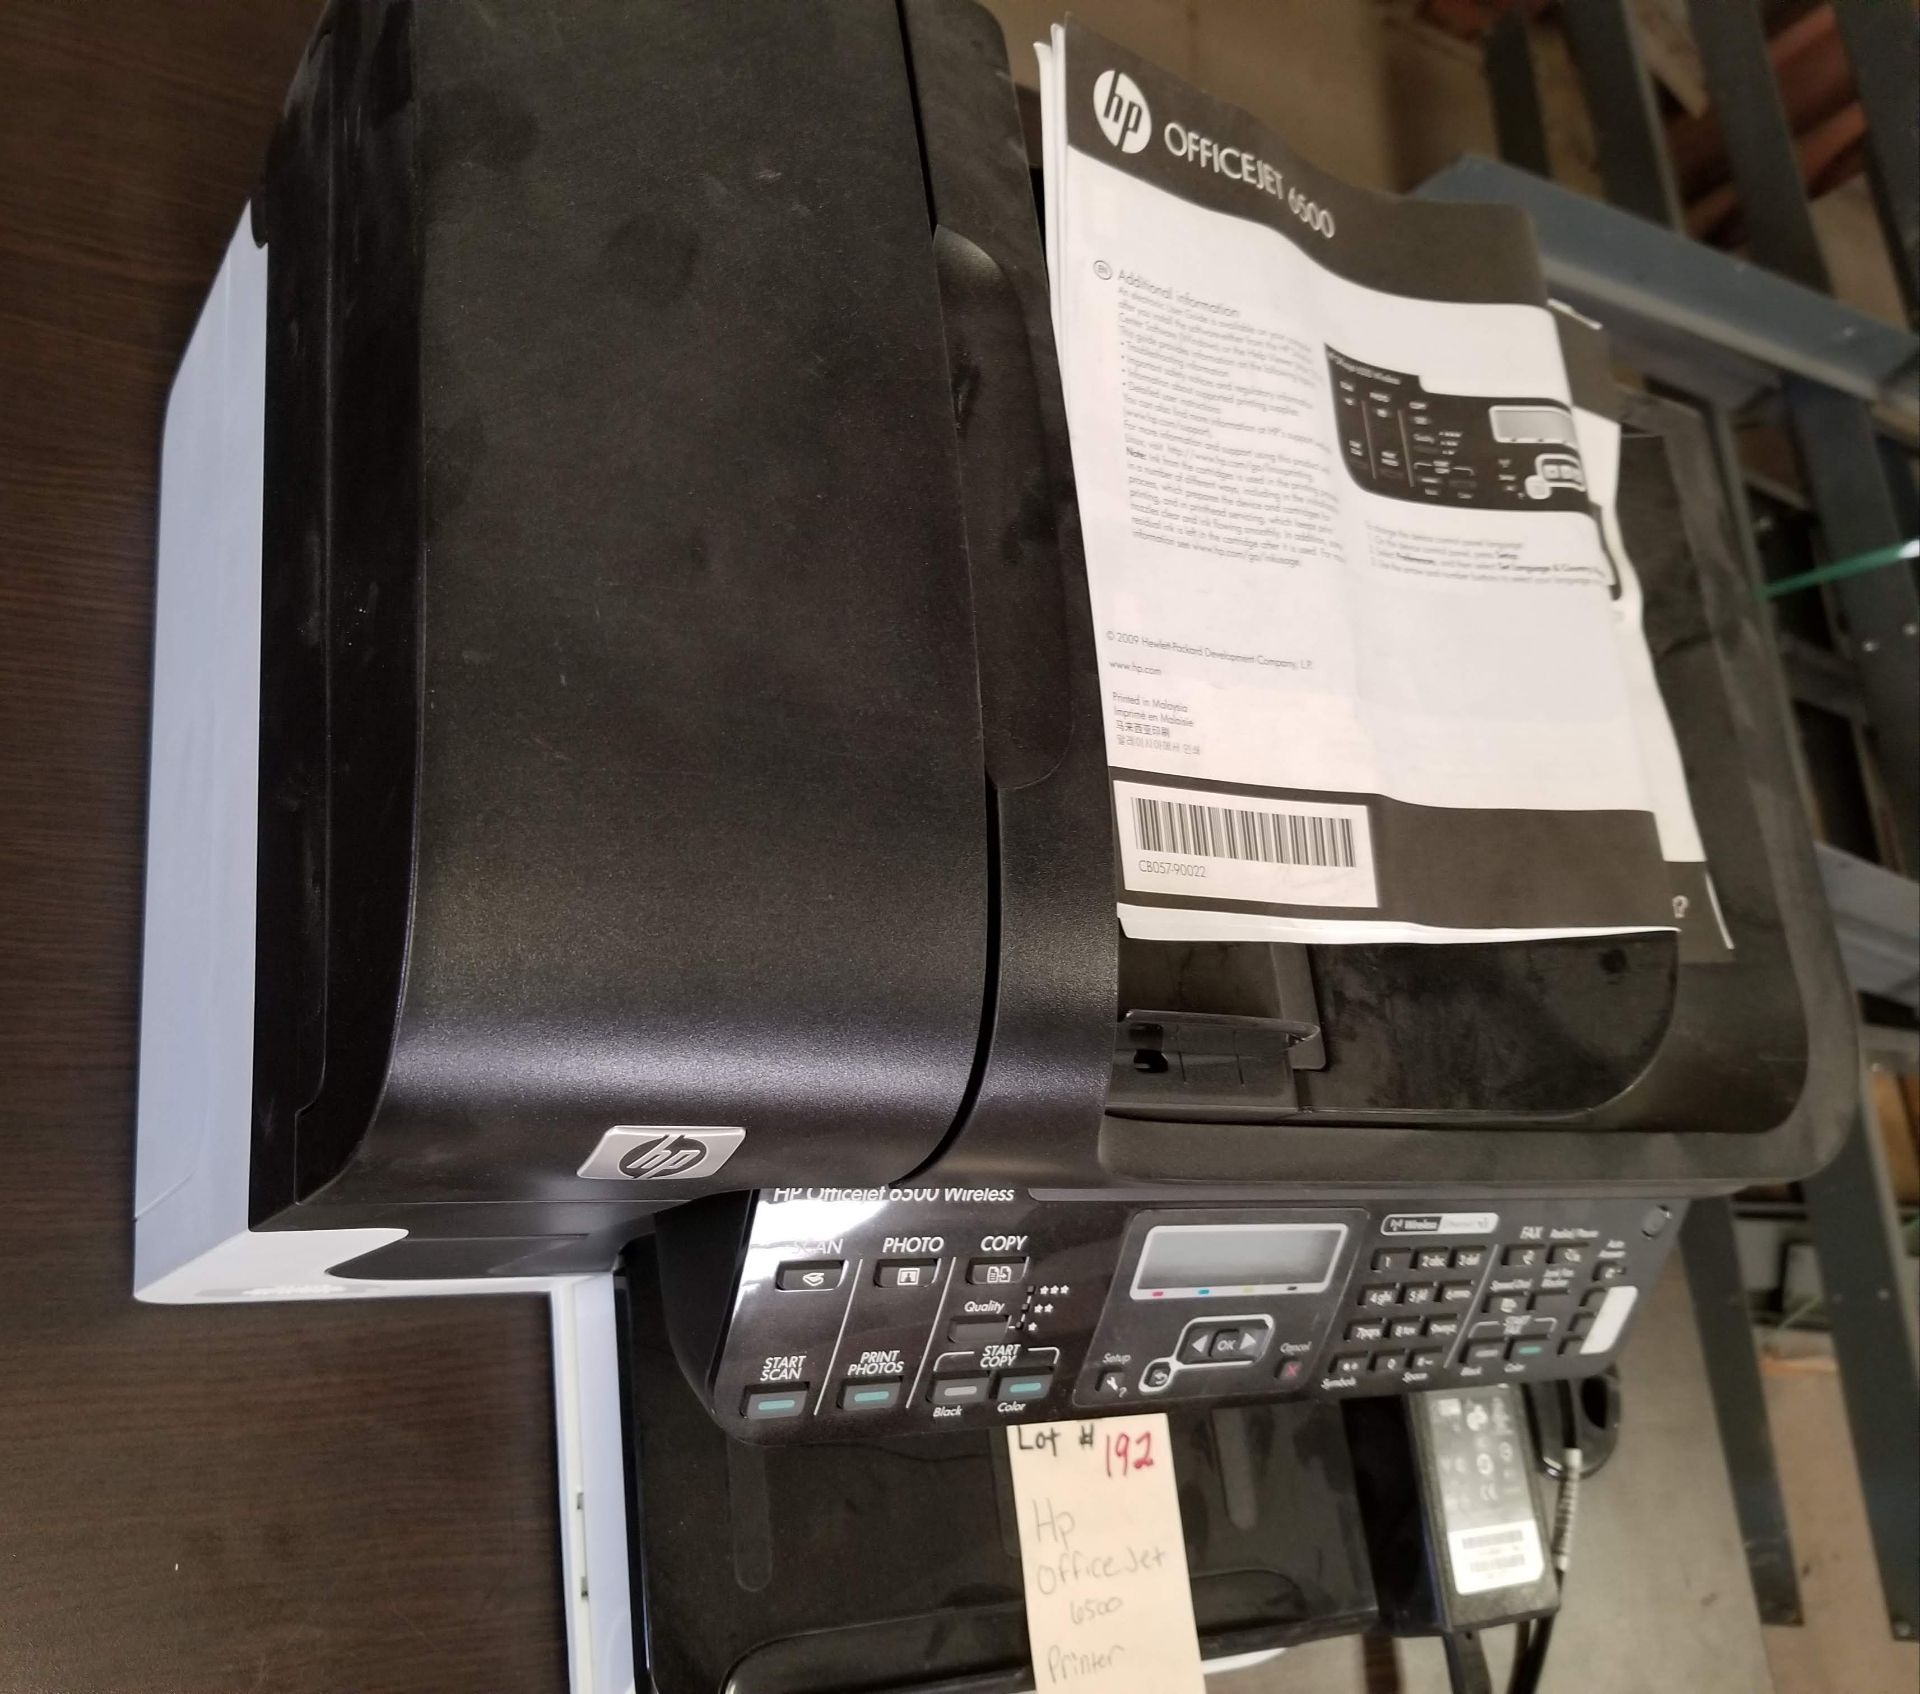 Lot 192 - HP Office Jet 6500 Printer